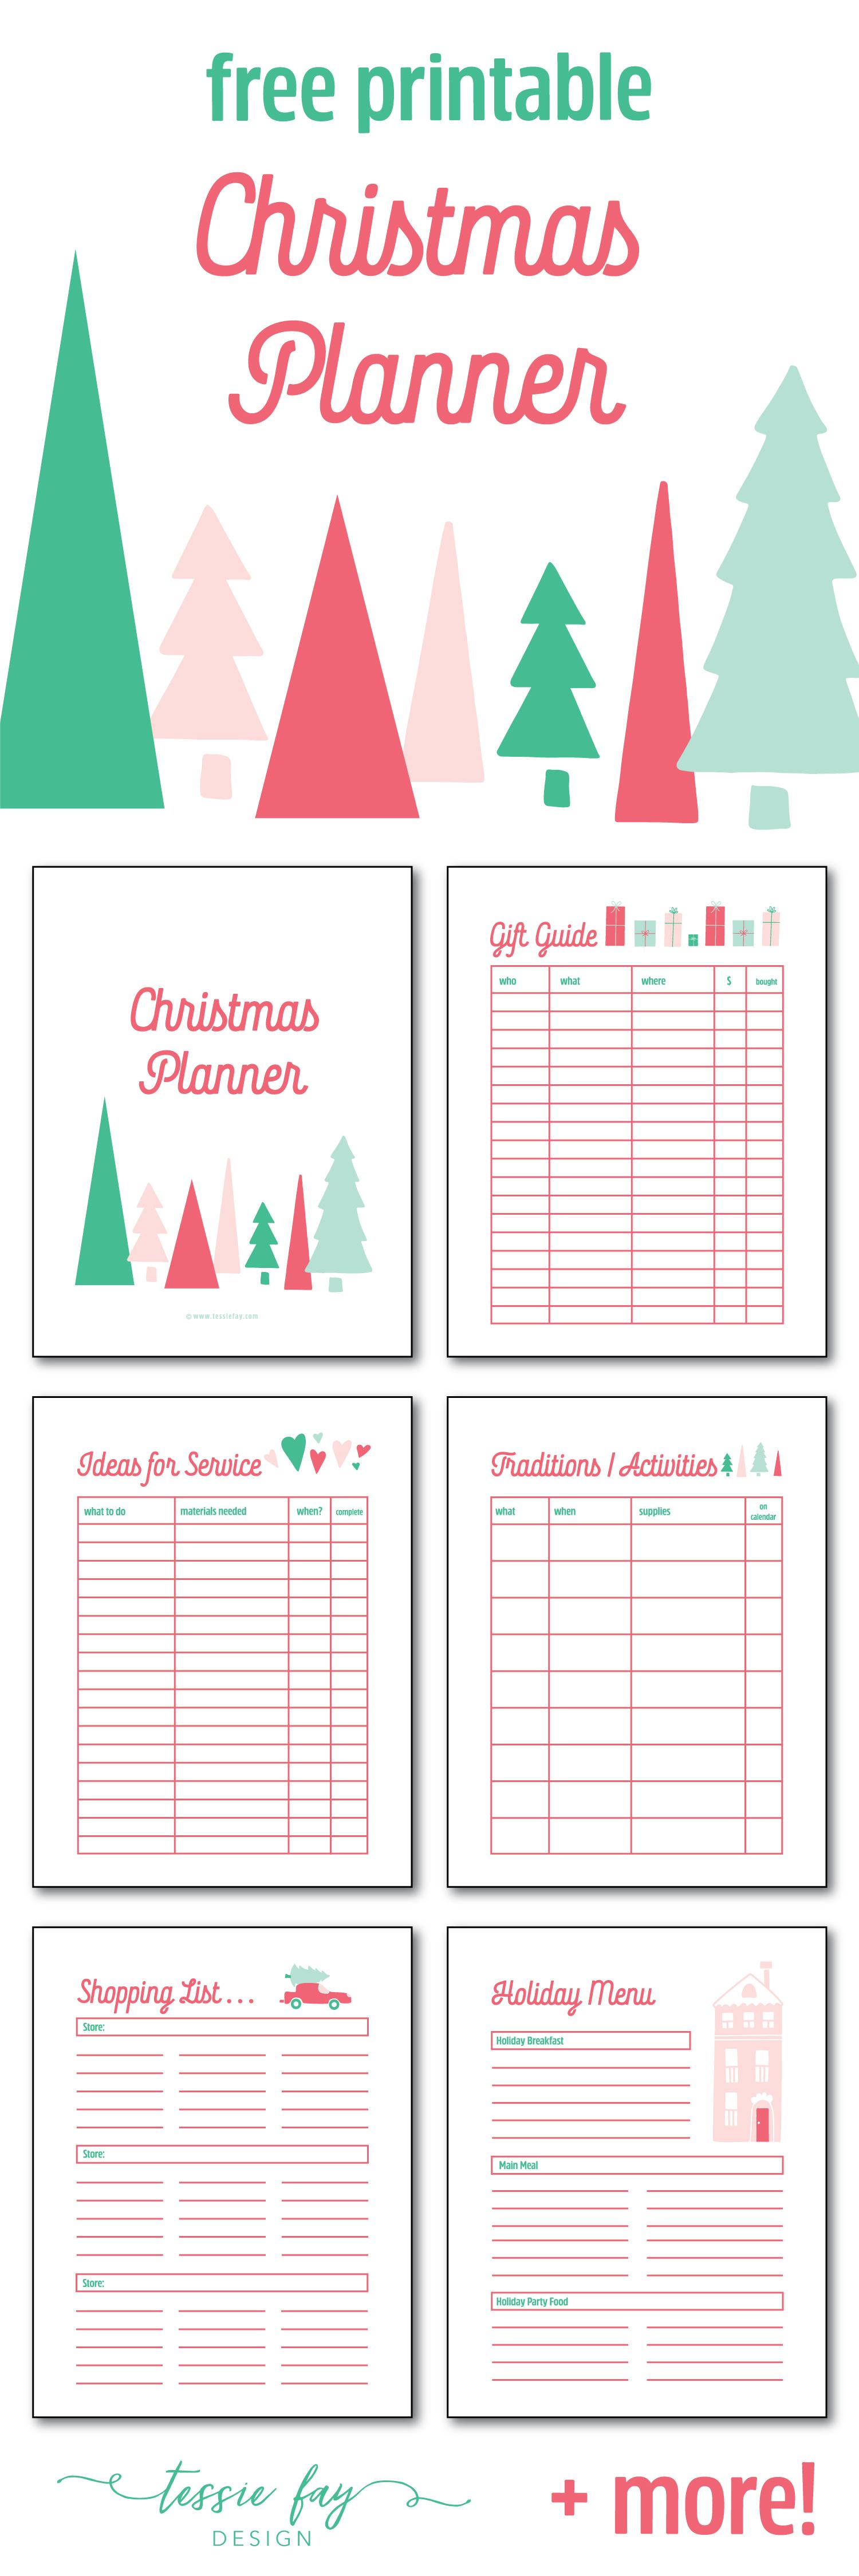 Free-Printable-Christmas-Planner.jpg